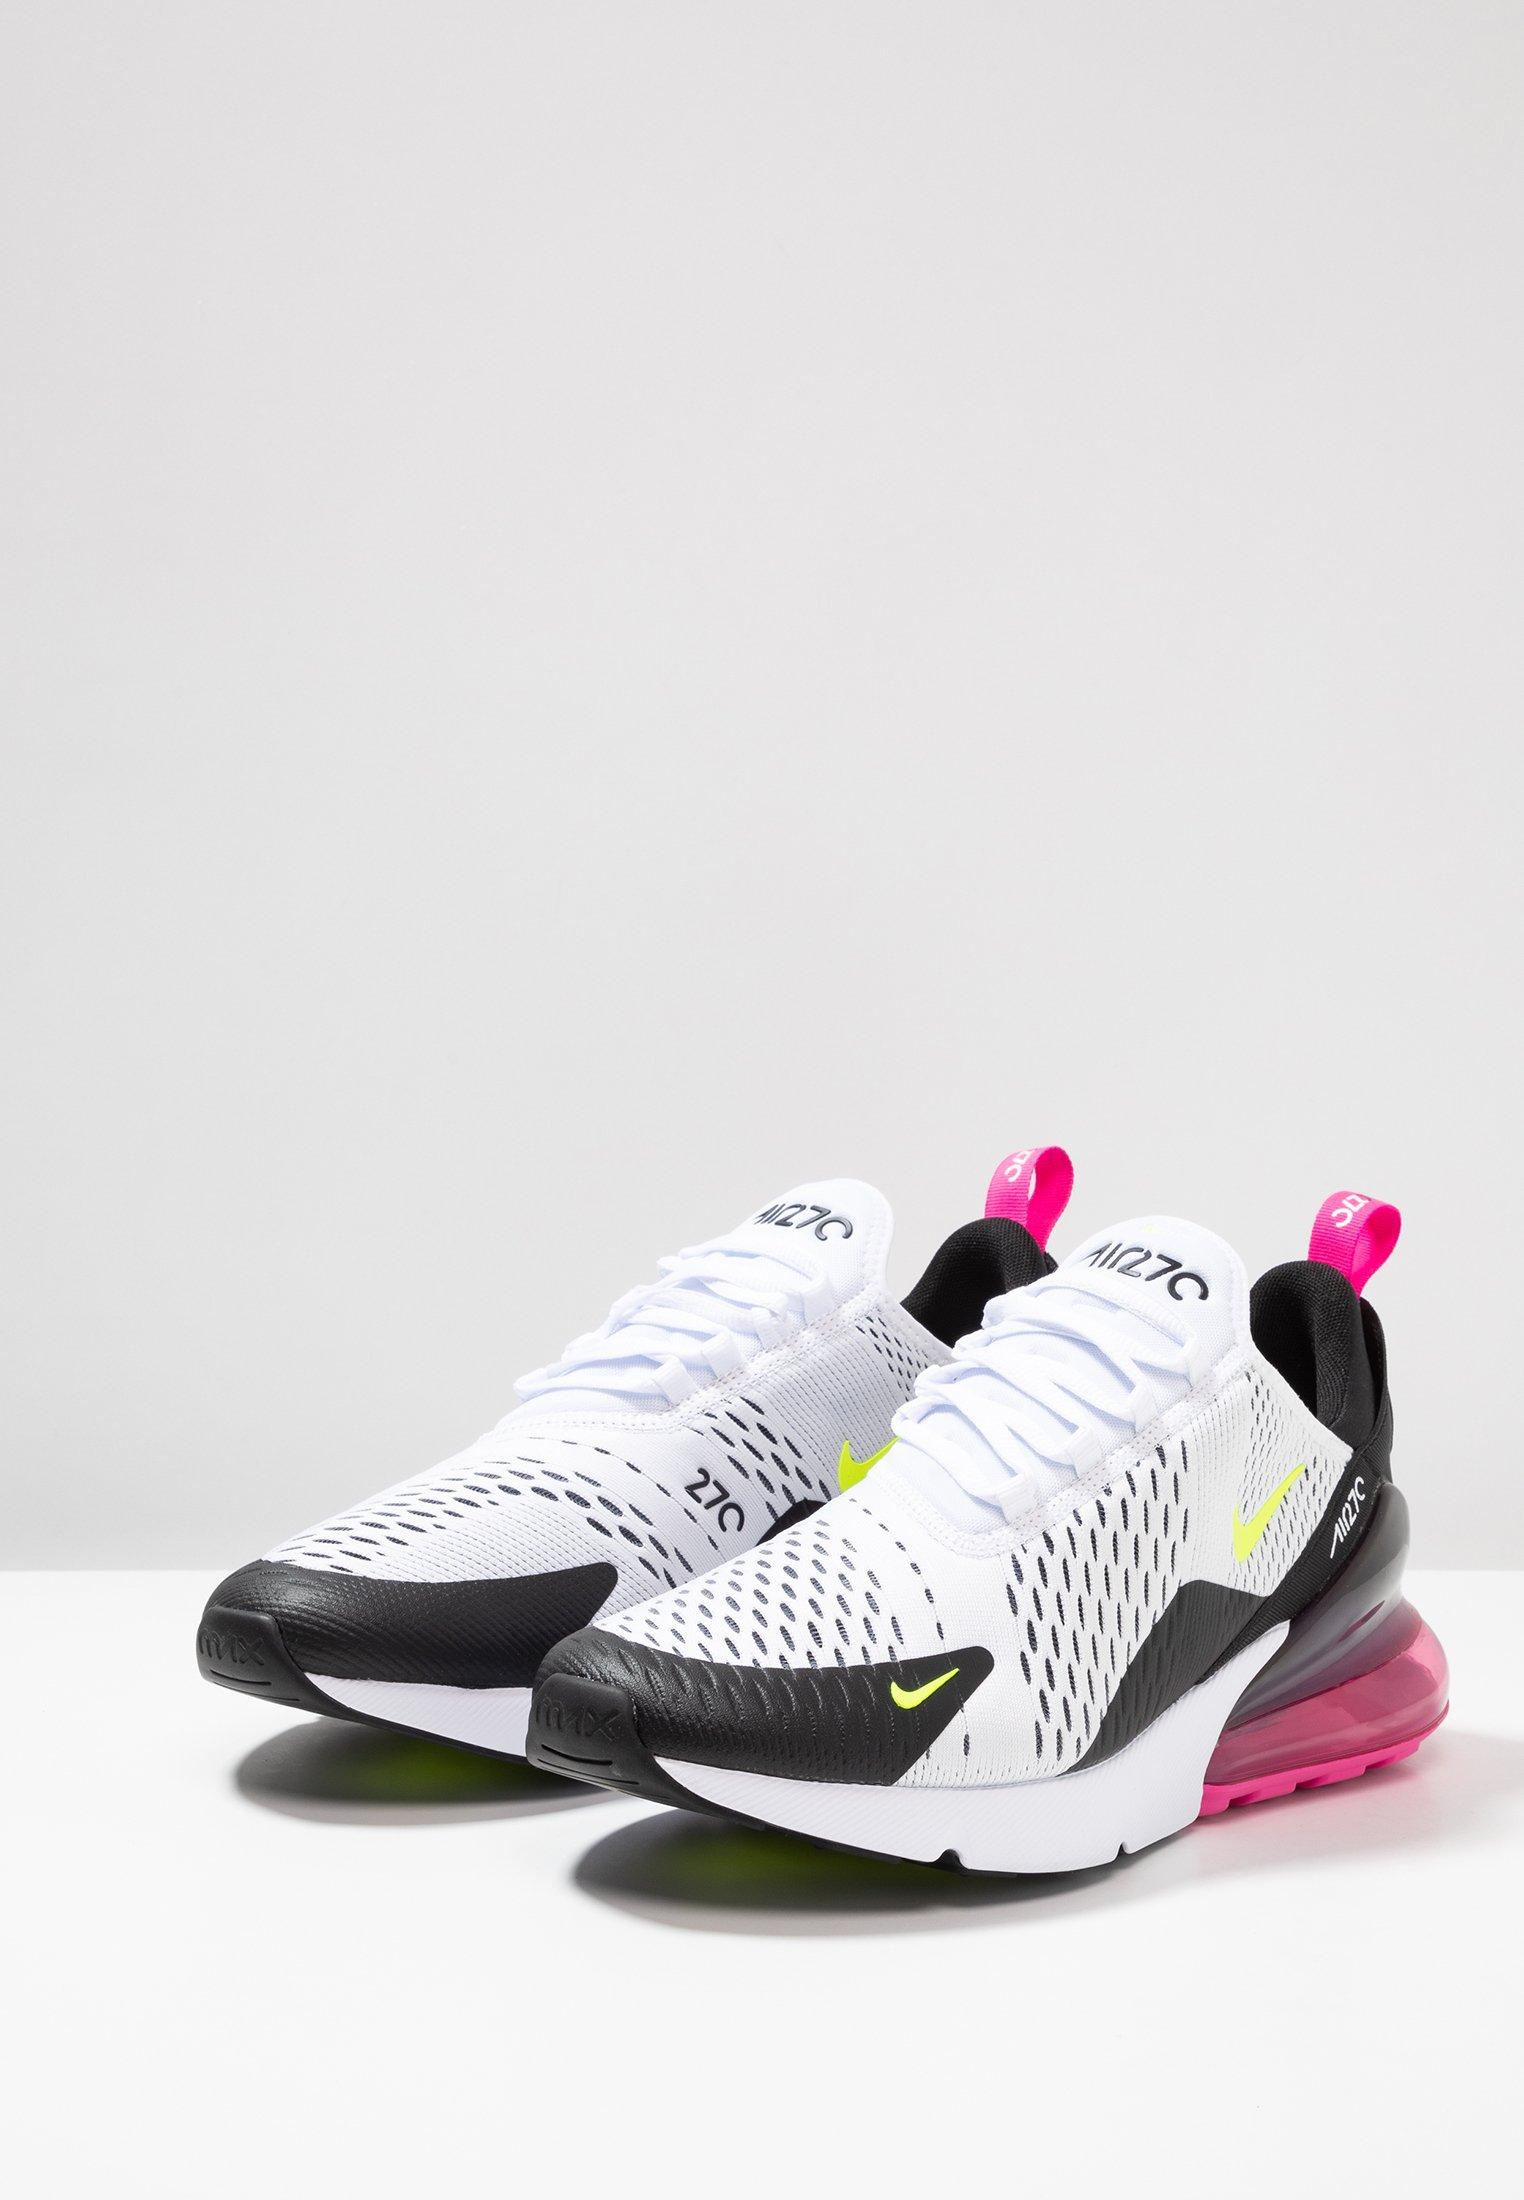 black laser Nike Air Fuchsia Max volt 270Baskets Sportswear White Basses mN8nOv0w